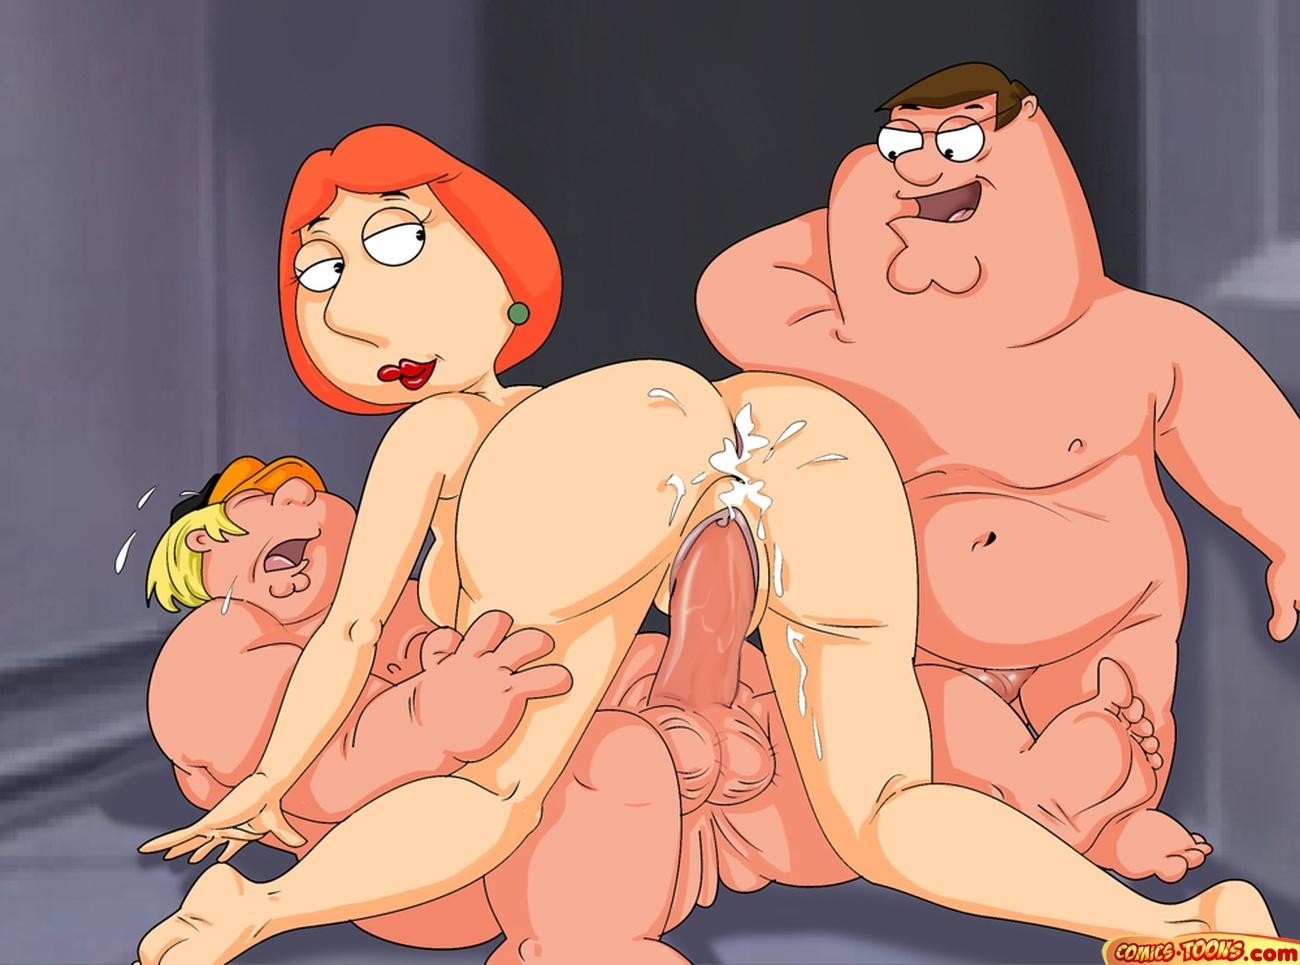 Bulma naked lesbian pornos gallery